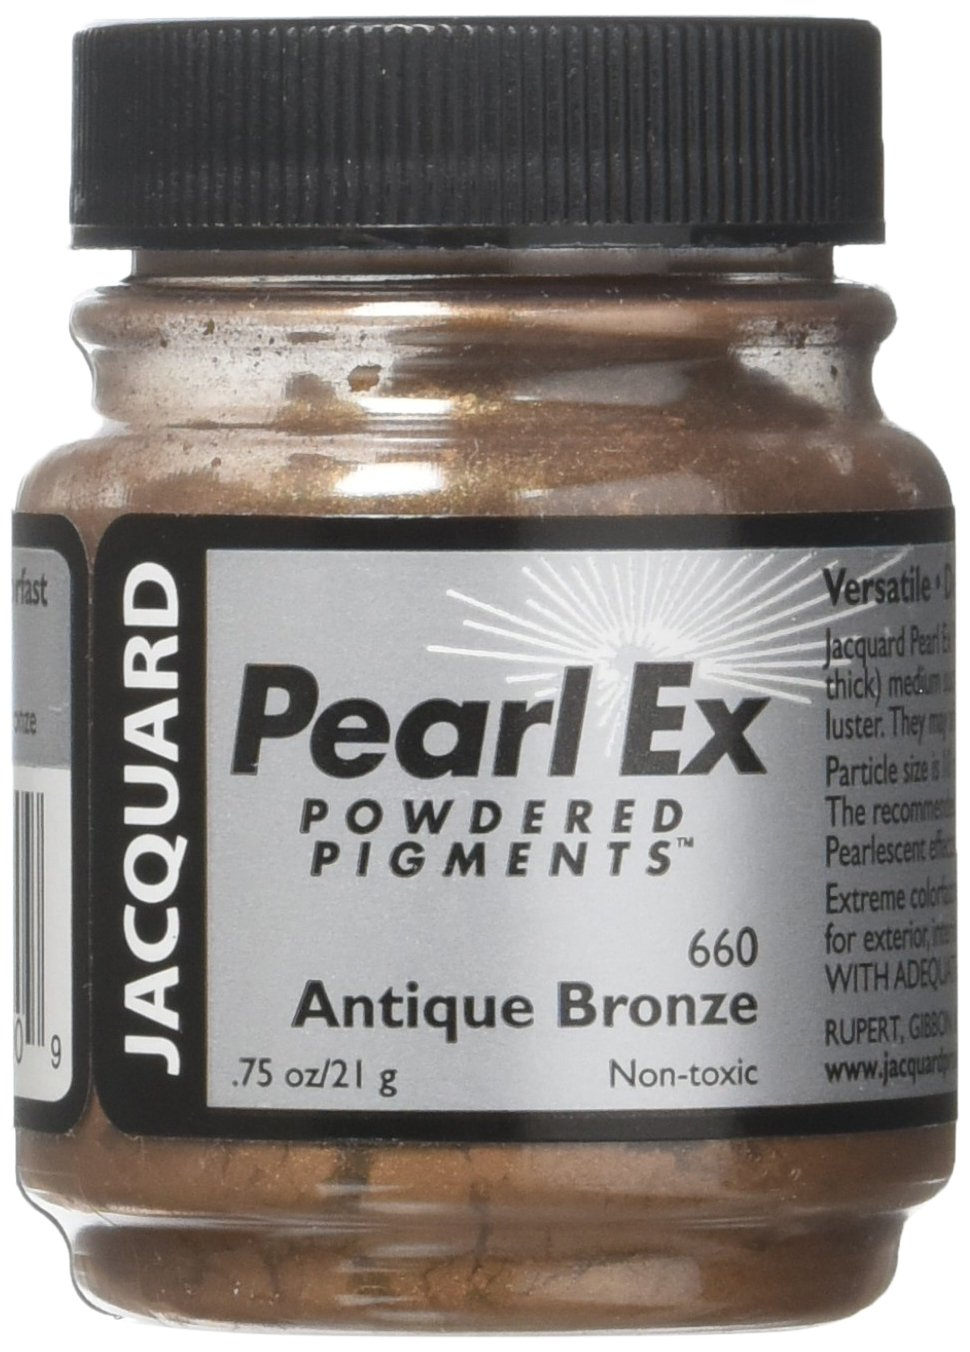 Pigmento Jacquard Pearl Ex 21gr. Bronce antiguo